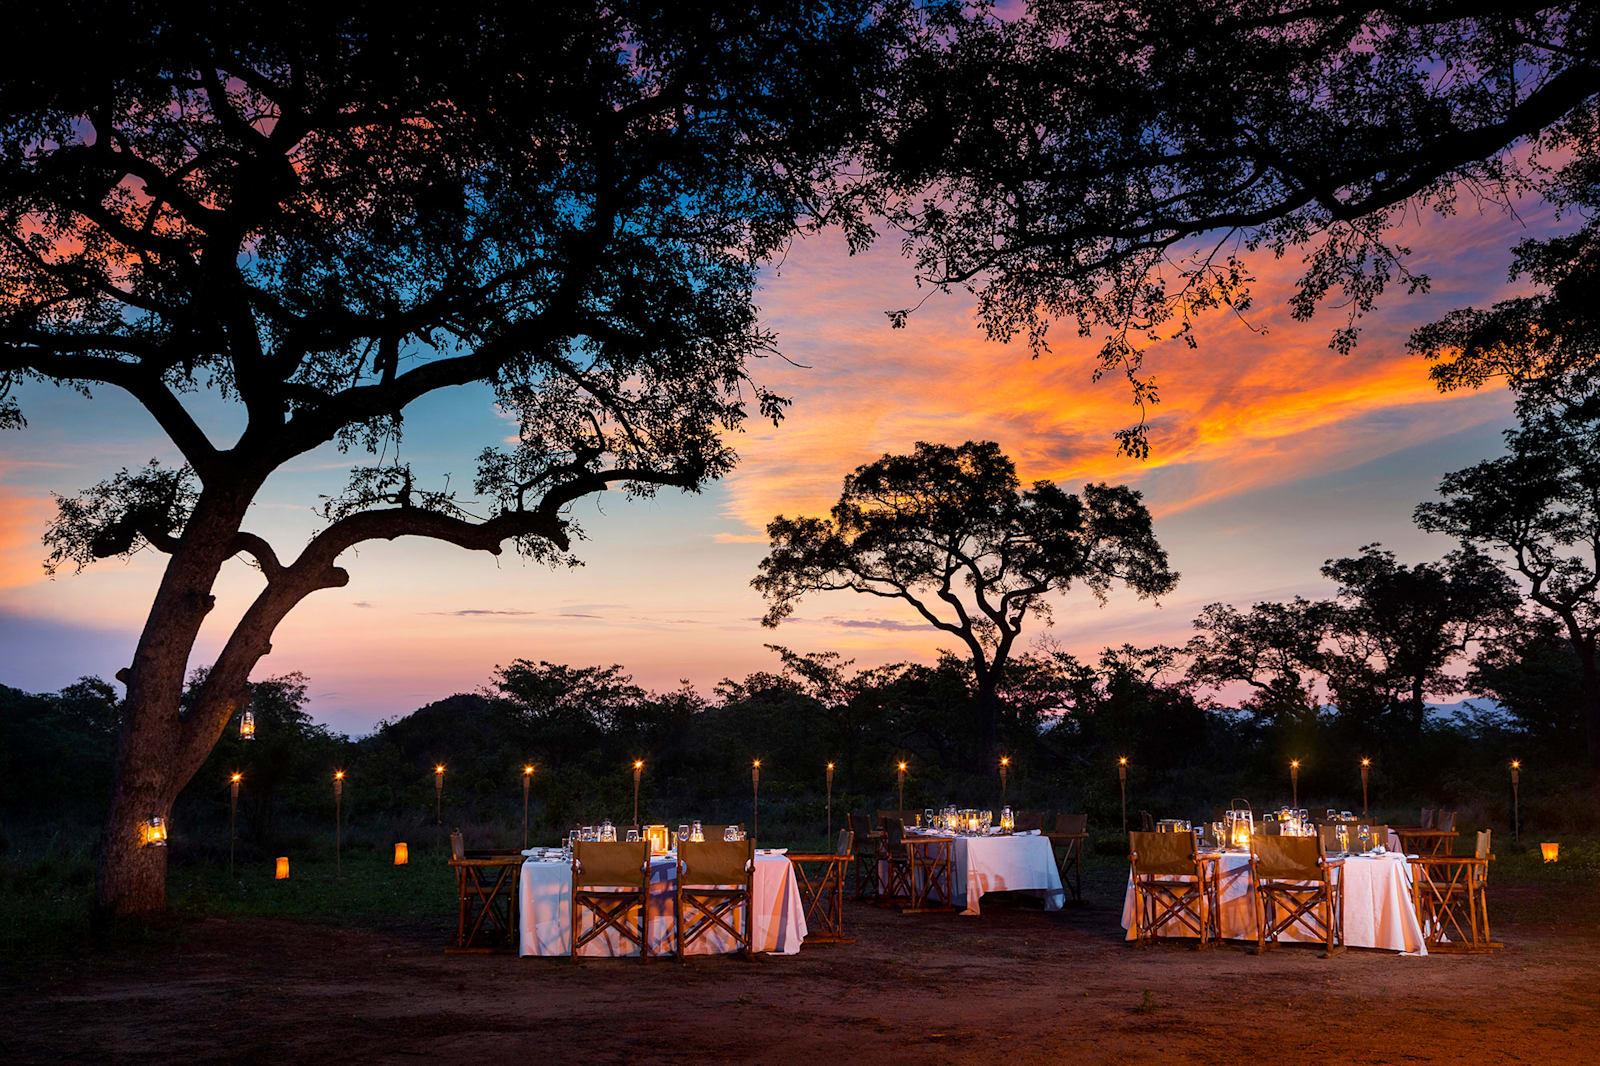 Happy Valentine's - is this the most romantic safari suite? https://t.co/o74na0OAdA https://t.co/AX0WJQI5Ki